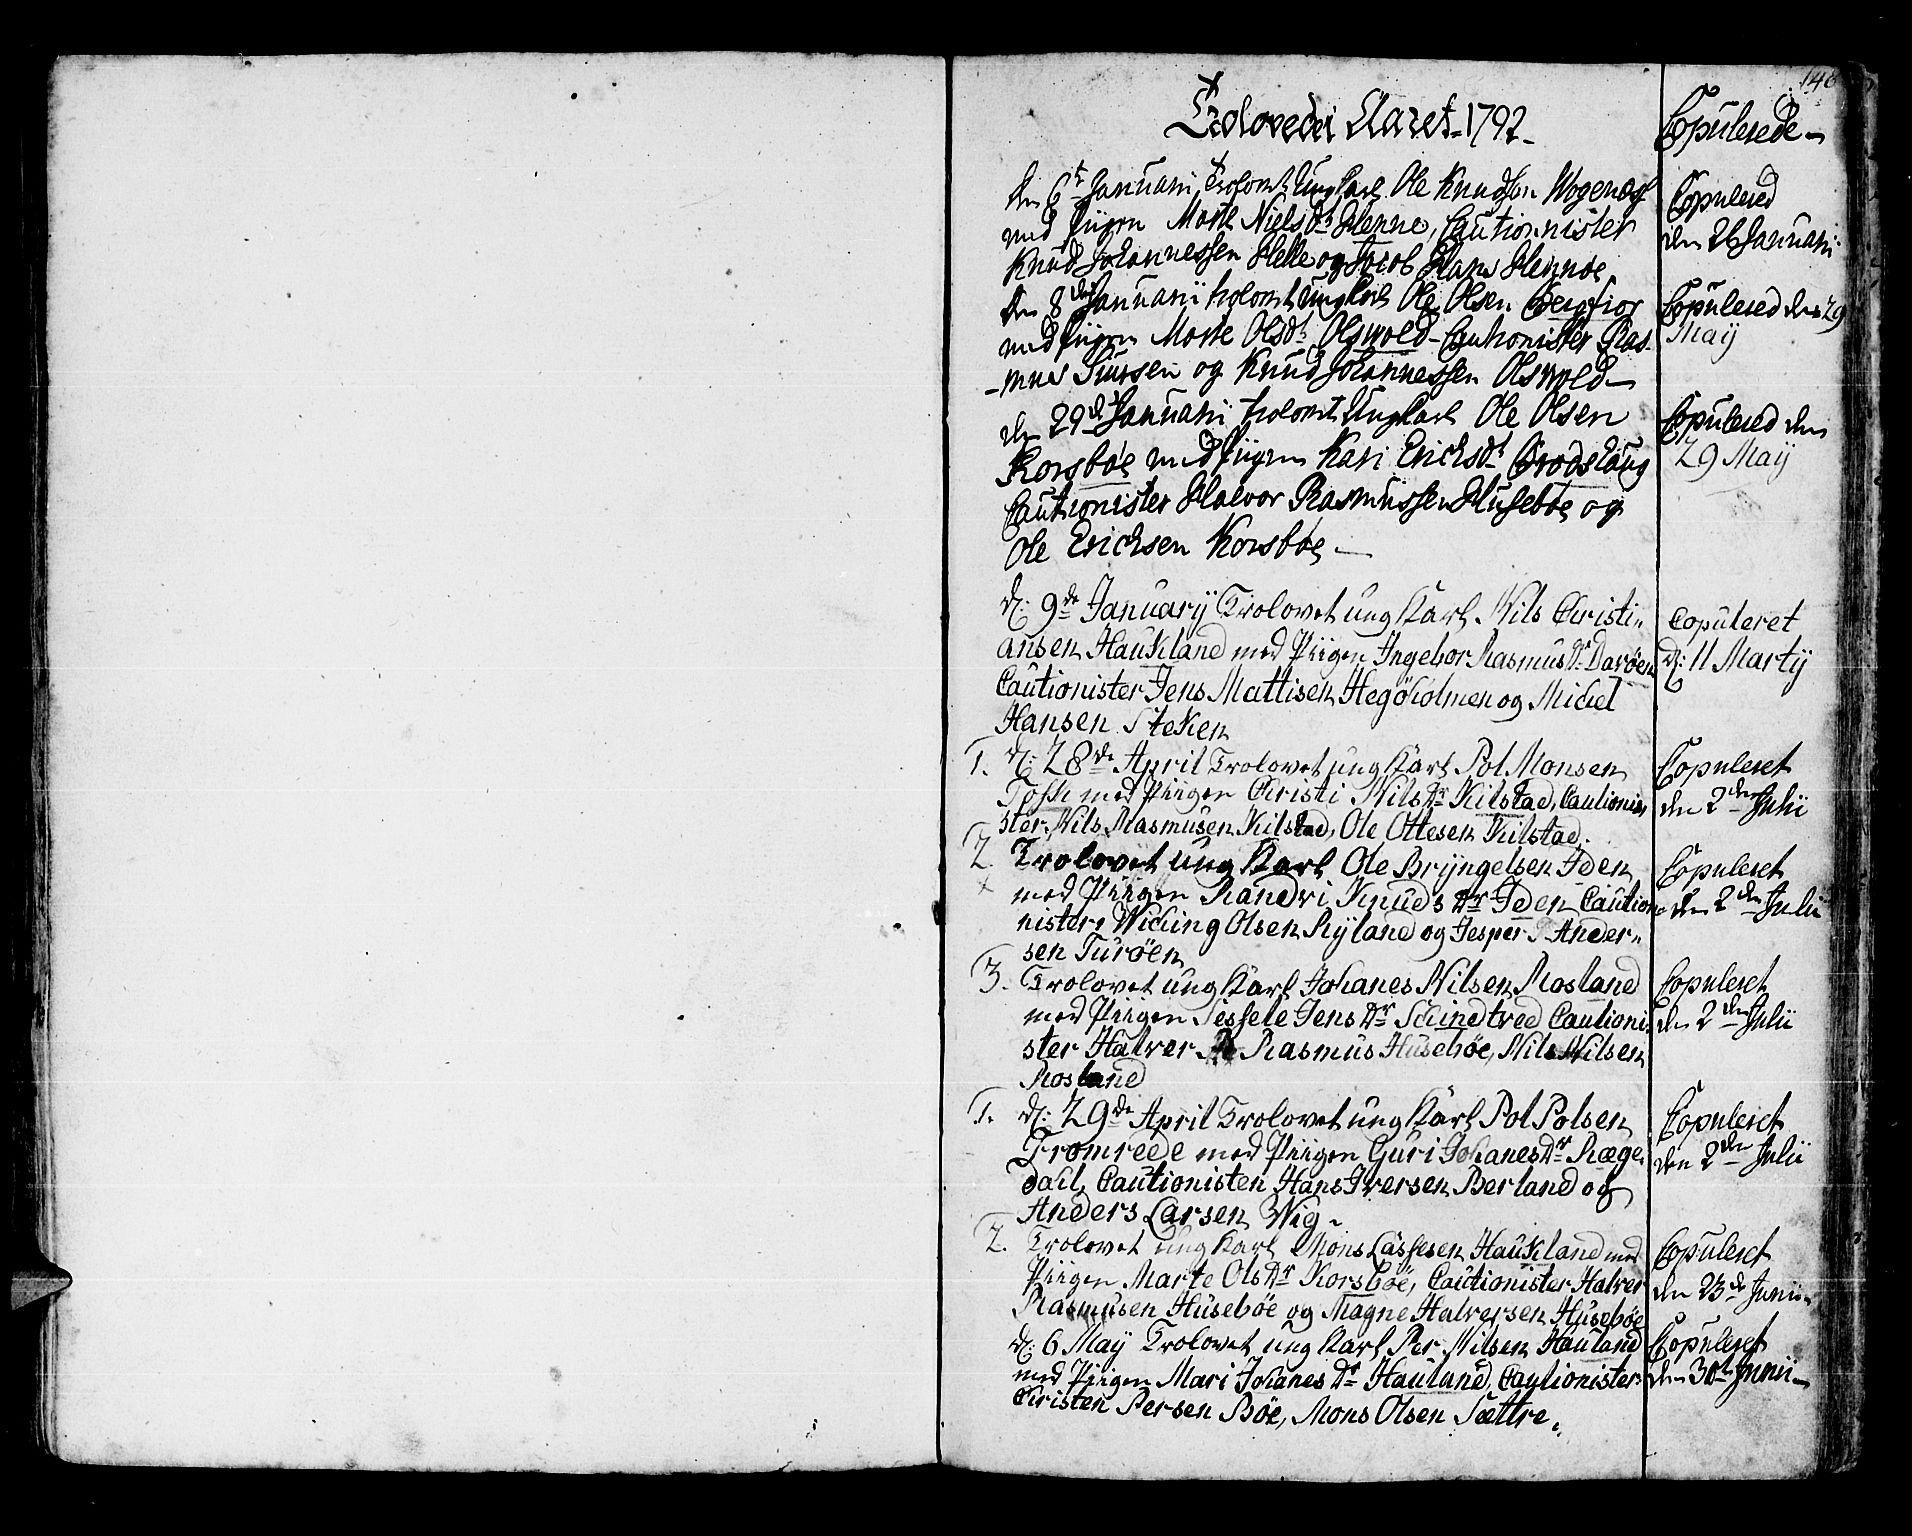 SAB, Manger sokneprestembete, H/Haa: Ministerialbok nr. A 2, 1792-1815, s. 148